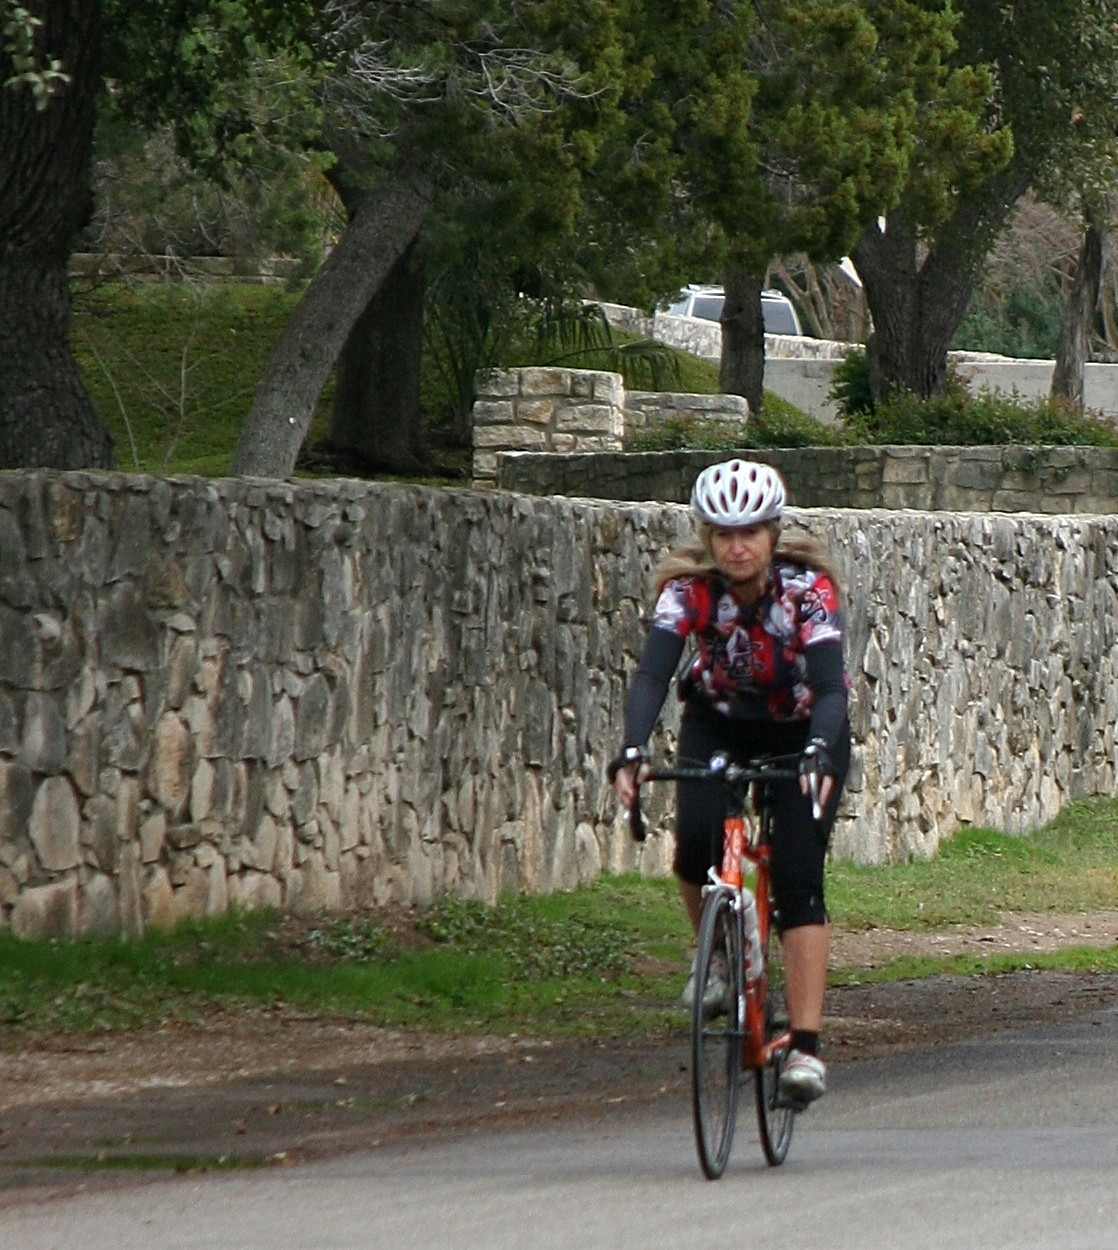 deaton on a bike